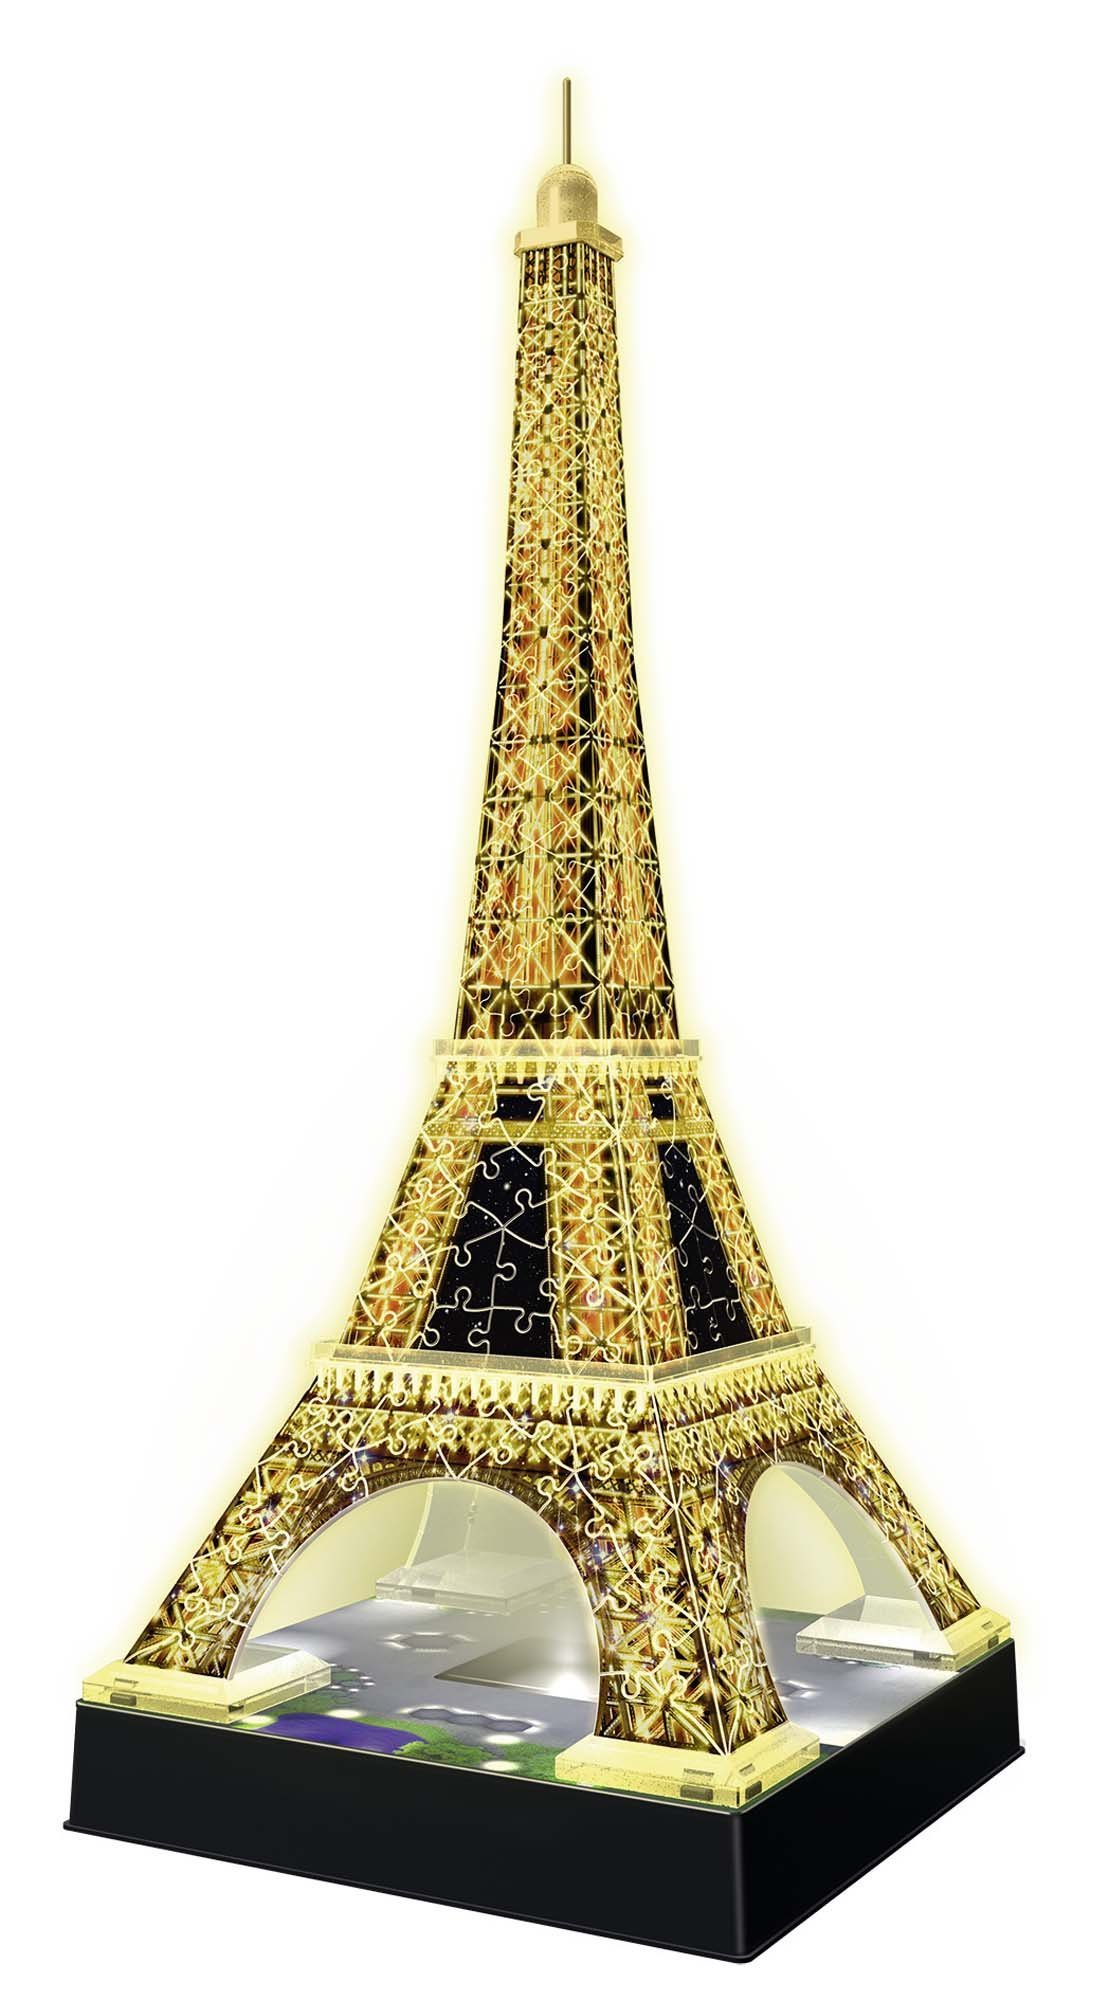 Ravensburger- Tour Torre Eiffel Puzzle 3D con LED, Edizione Speciale Notte, 216 Pezzi, Multicolore, 12579 2 spesavip